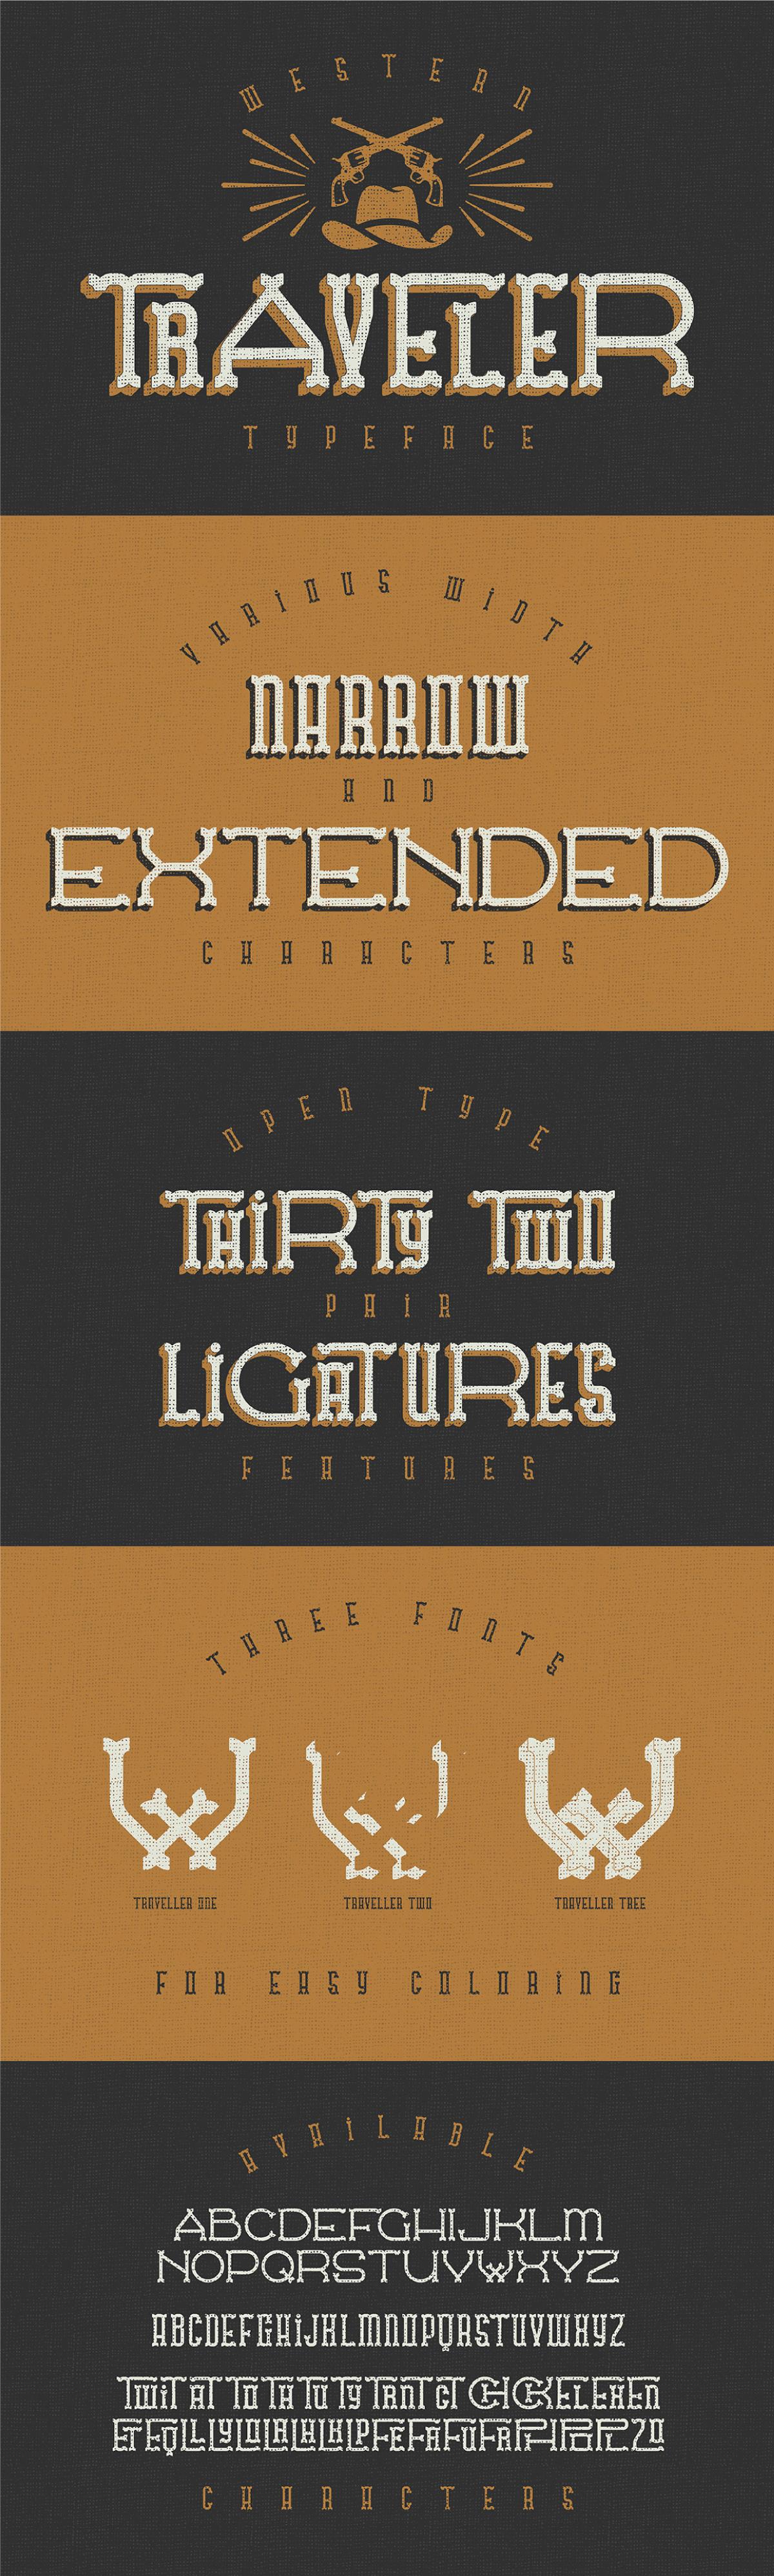 Traveler-Free-Western-Typeface